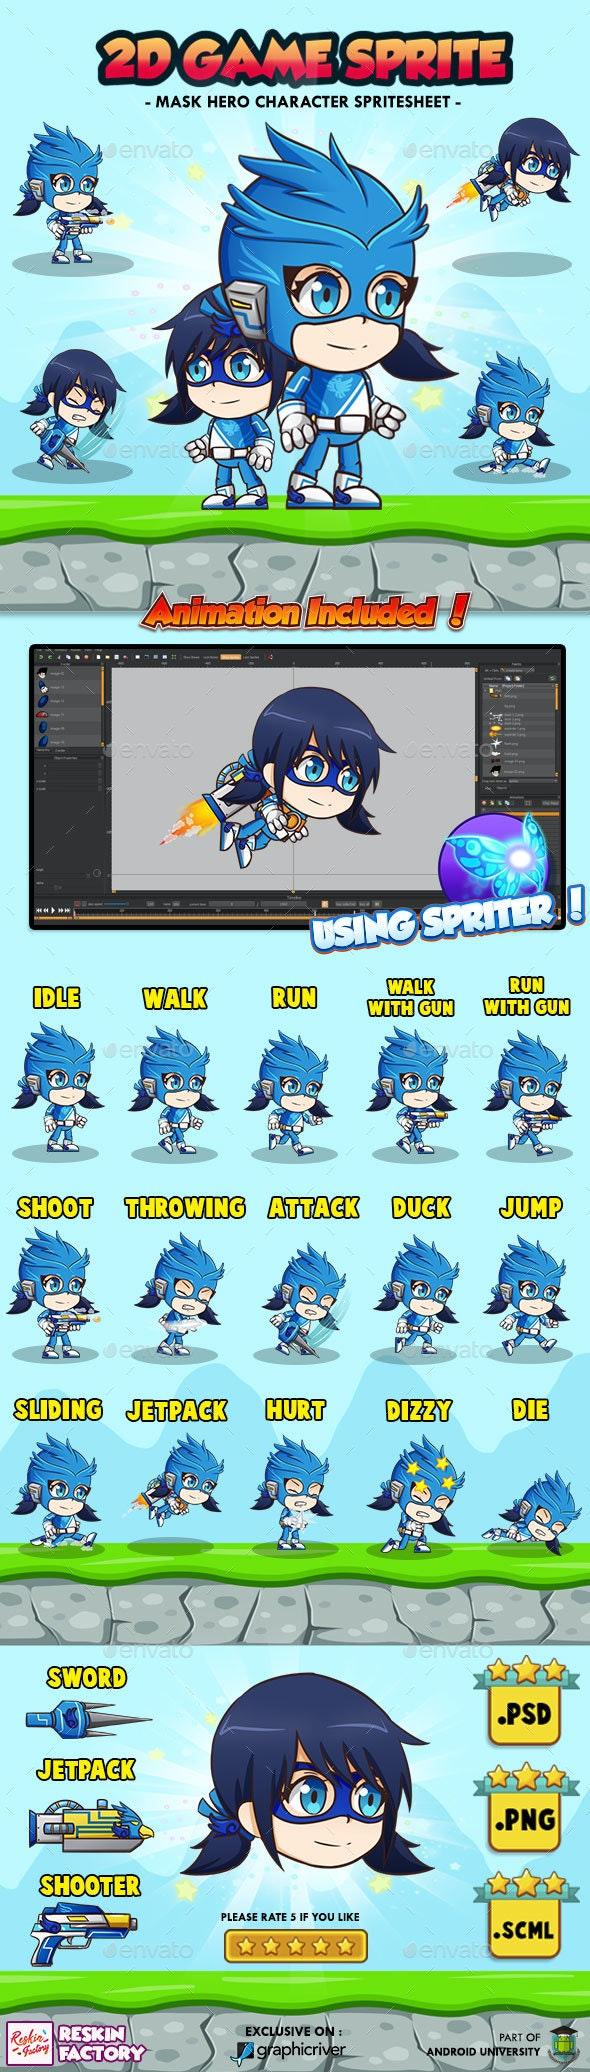 Hero Mask Blue - 2D Game Character Sprites - Sprites Game Assets